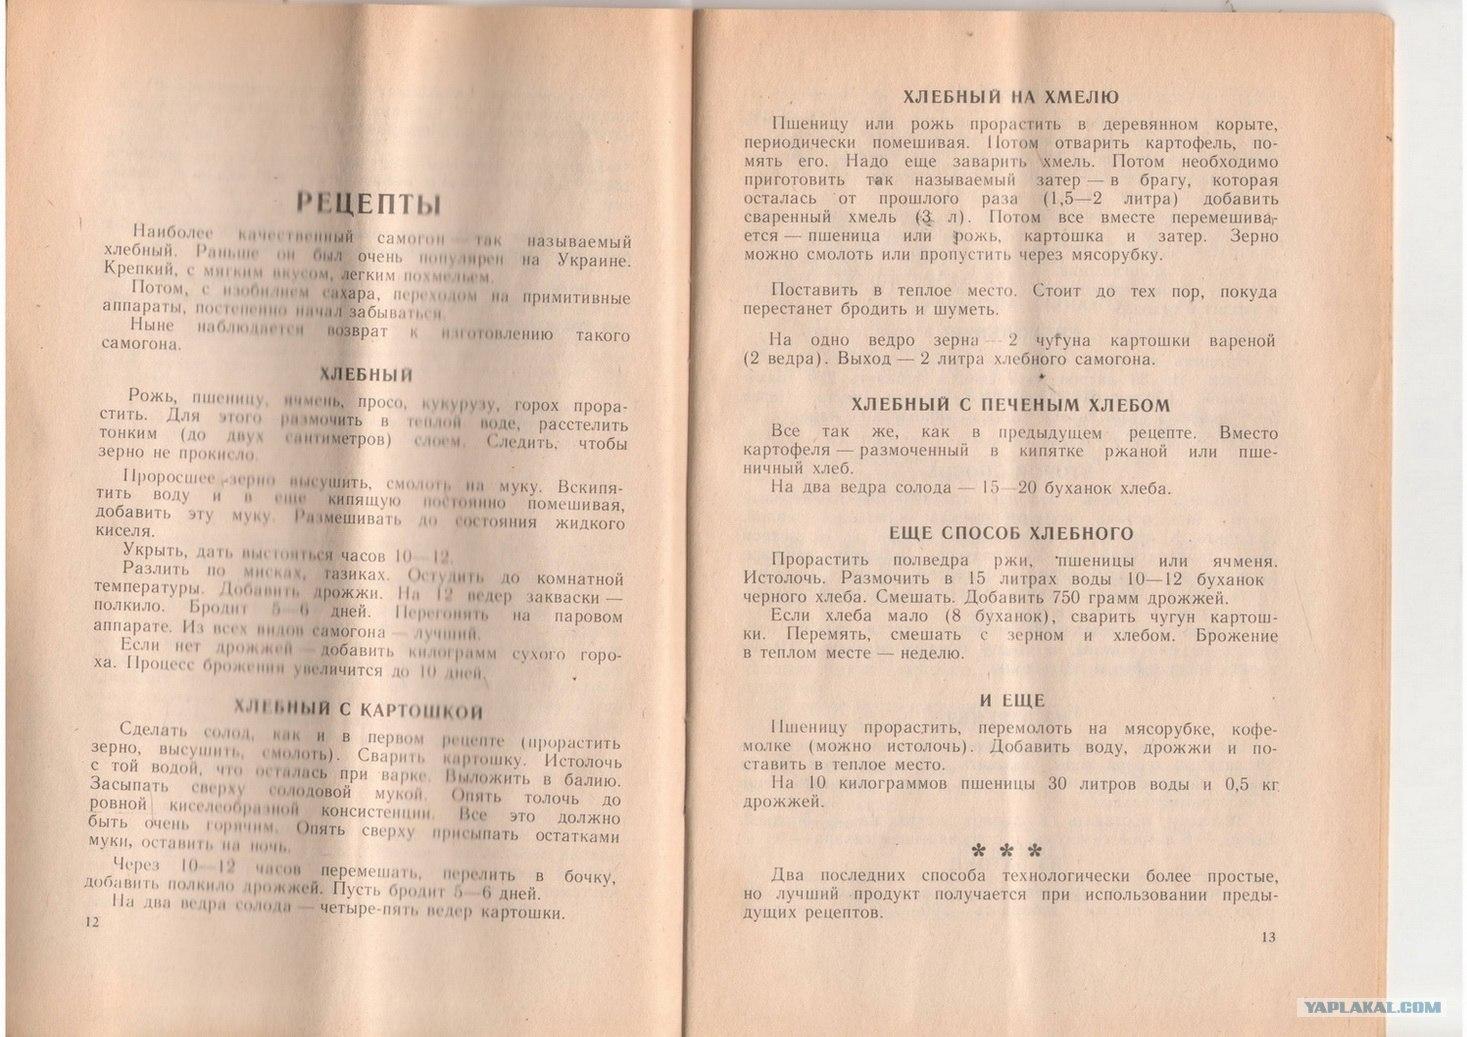 Рецепт браги самогона дрожжах